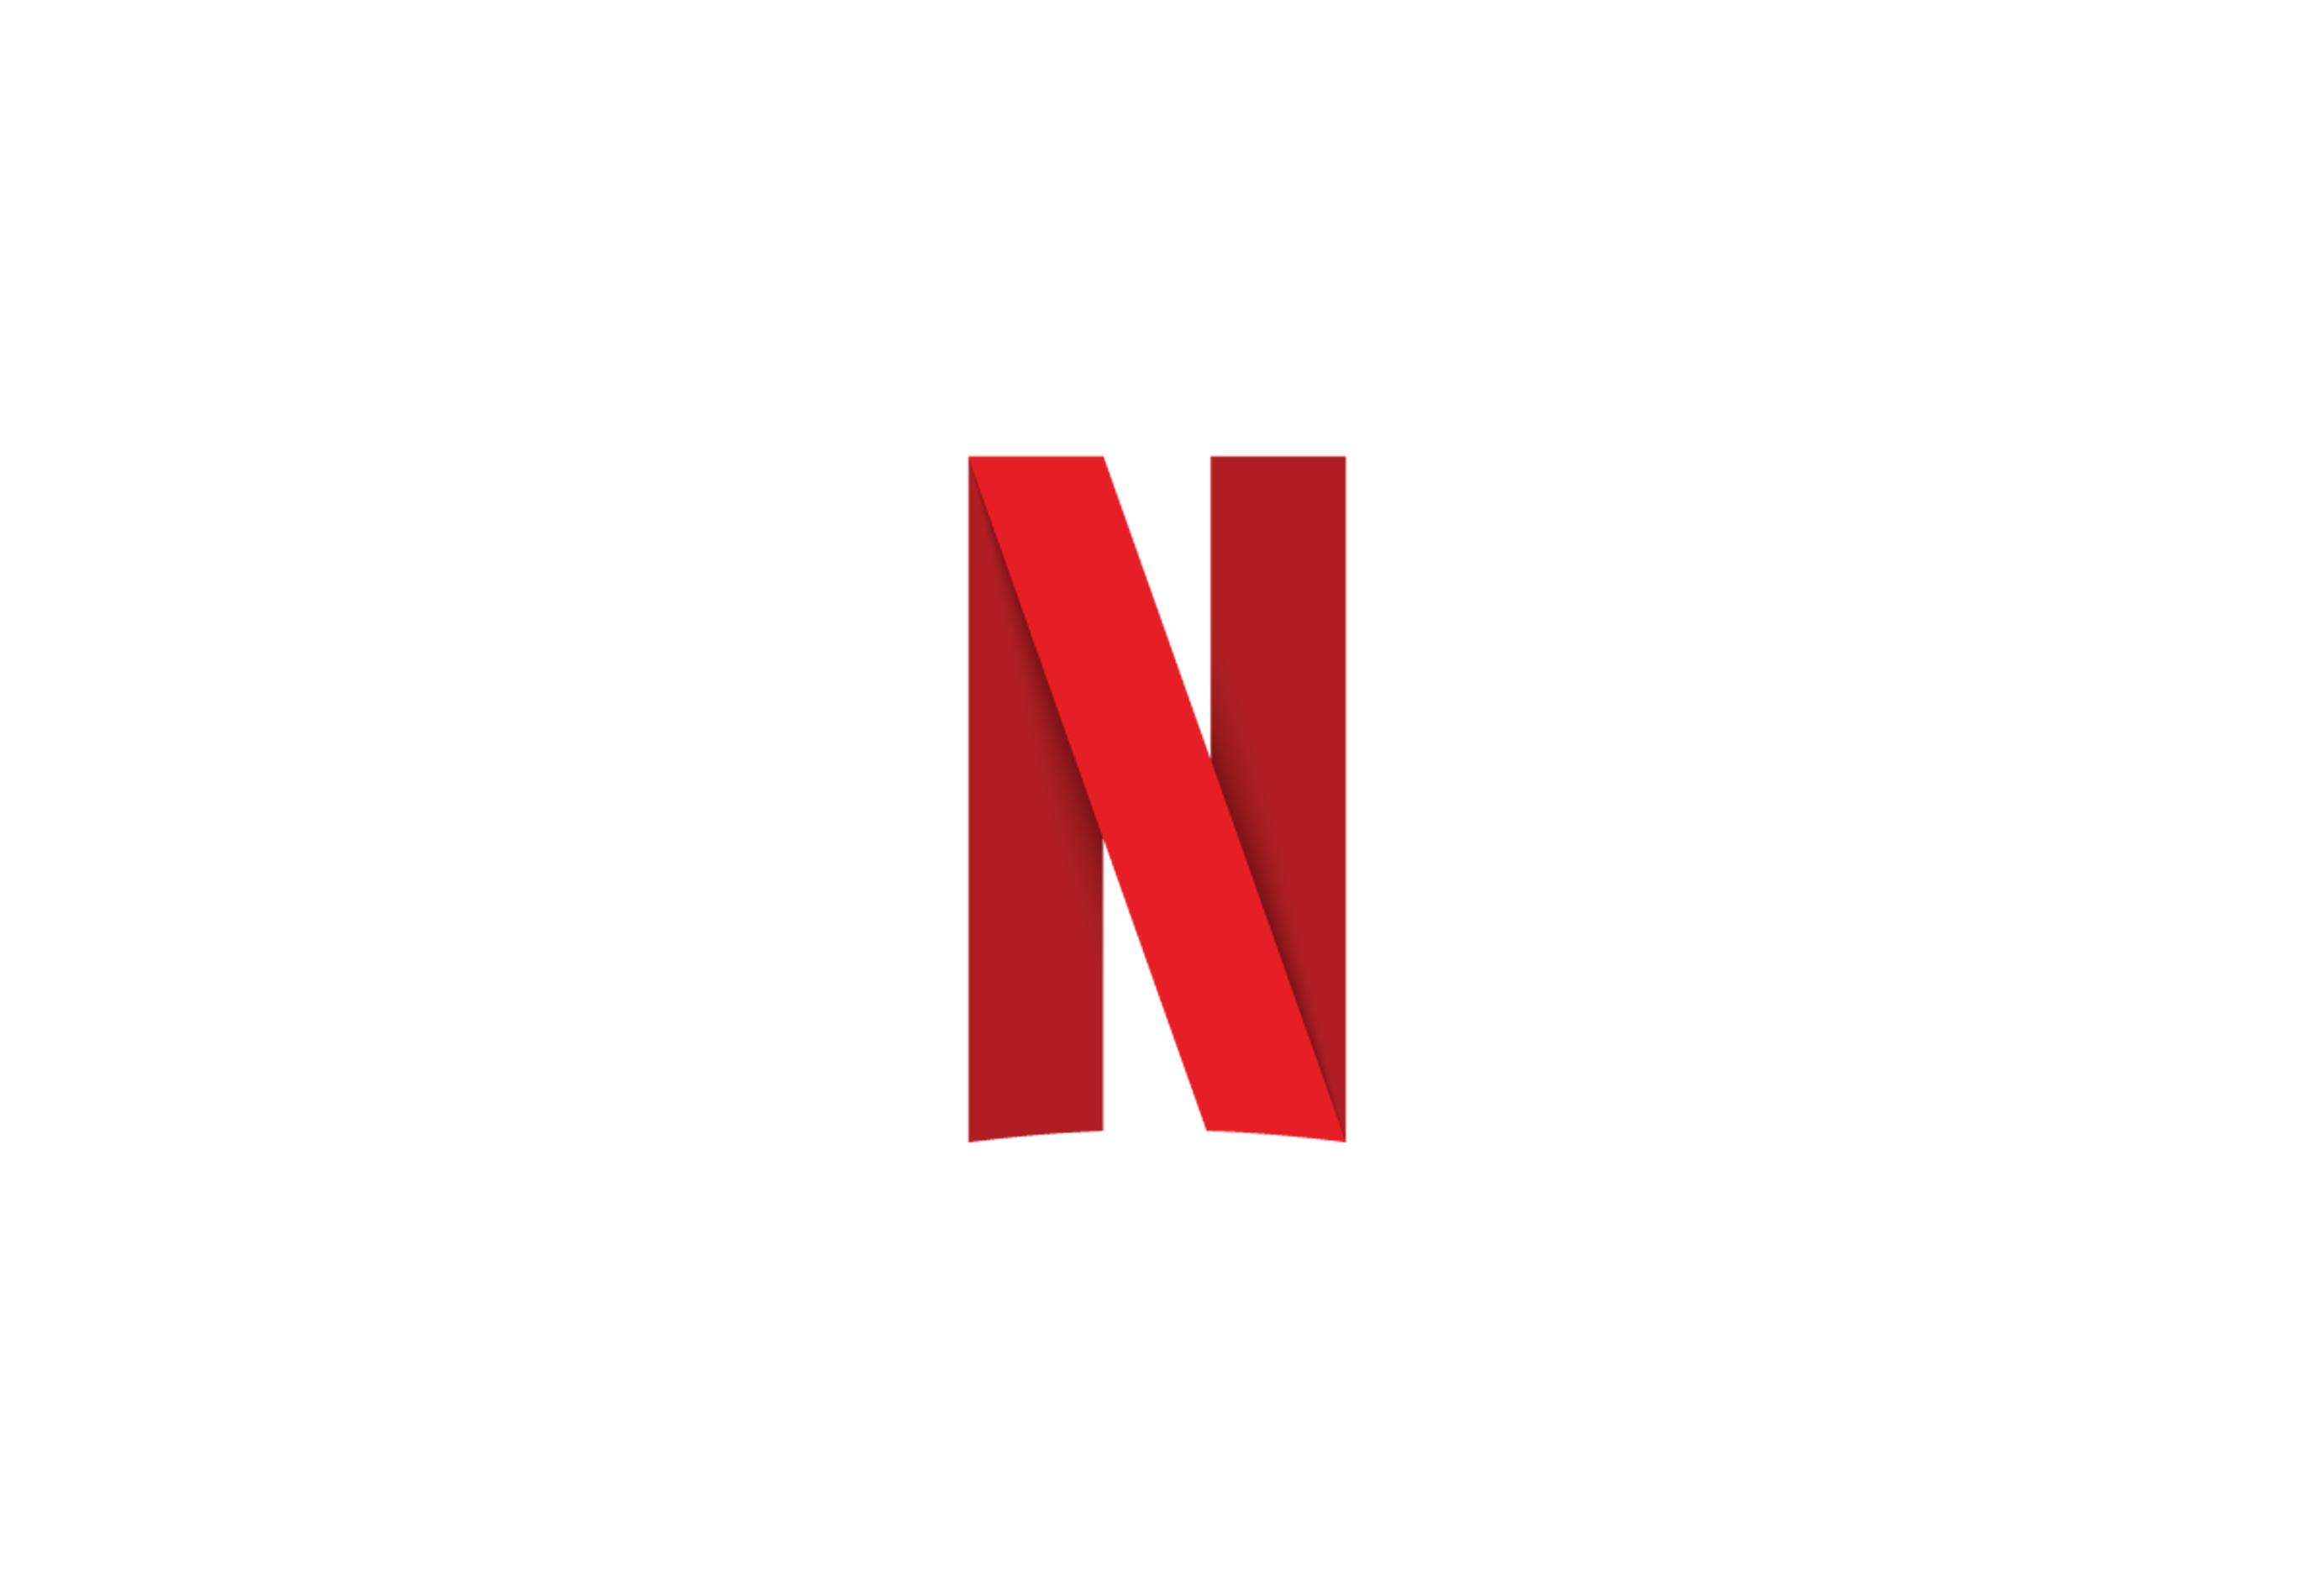 Netflix logo and symbol  Design history and evolution